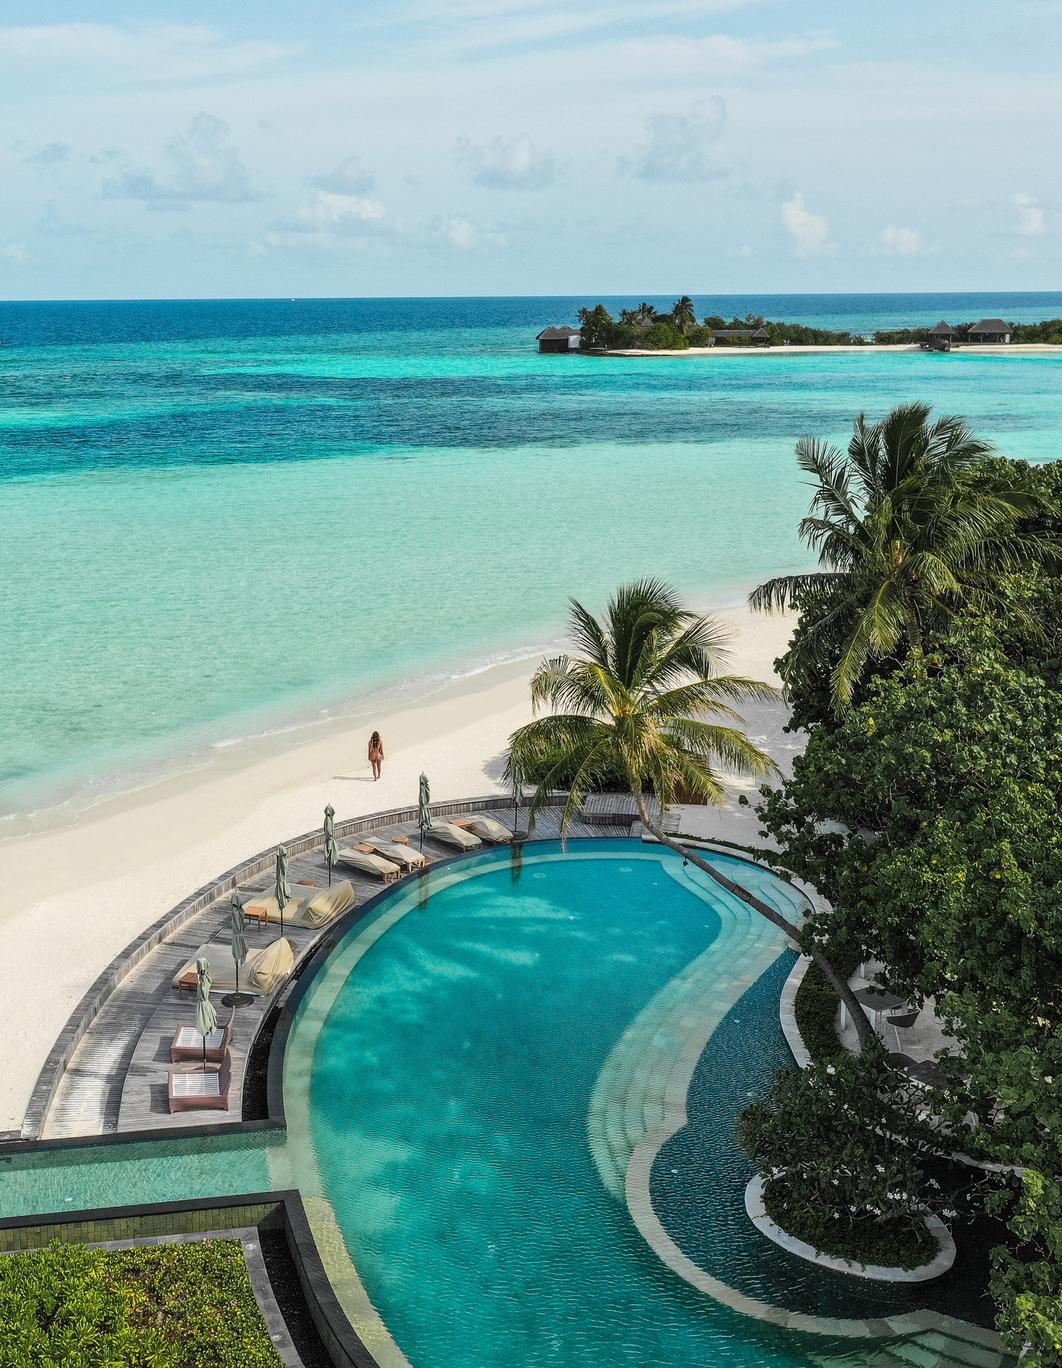 Four Seasons Kuda Huraa – A Maldivian Classic Island Getaway